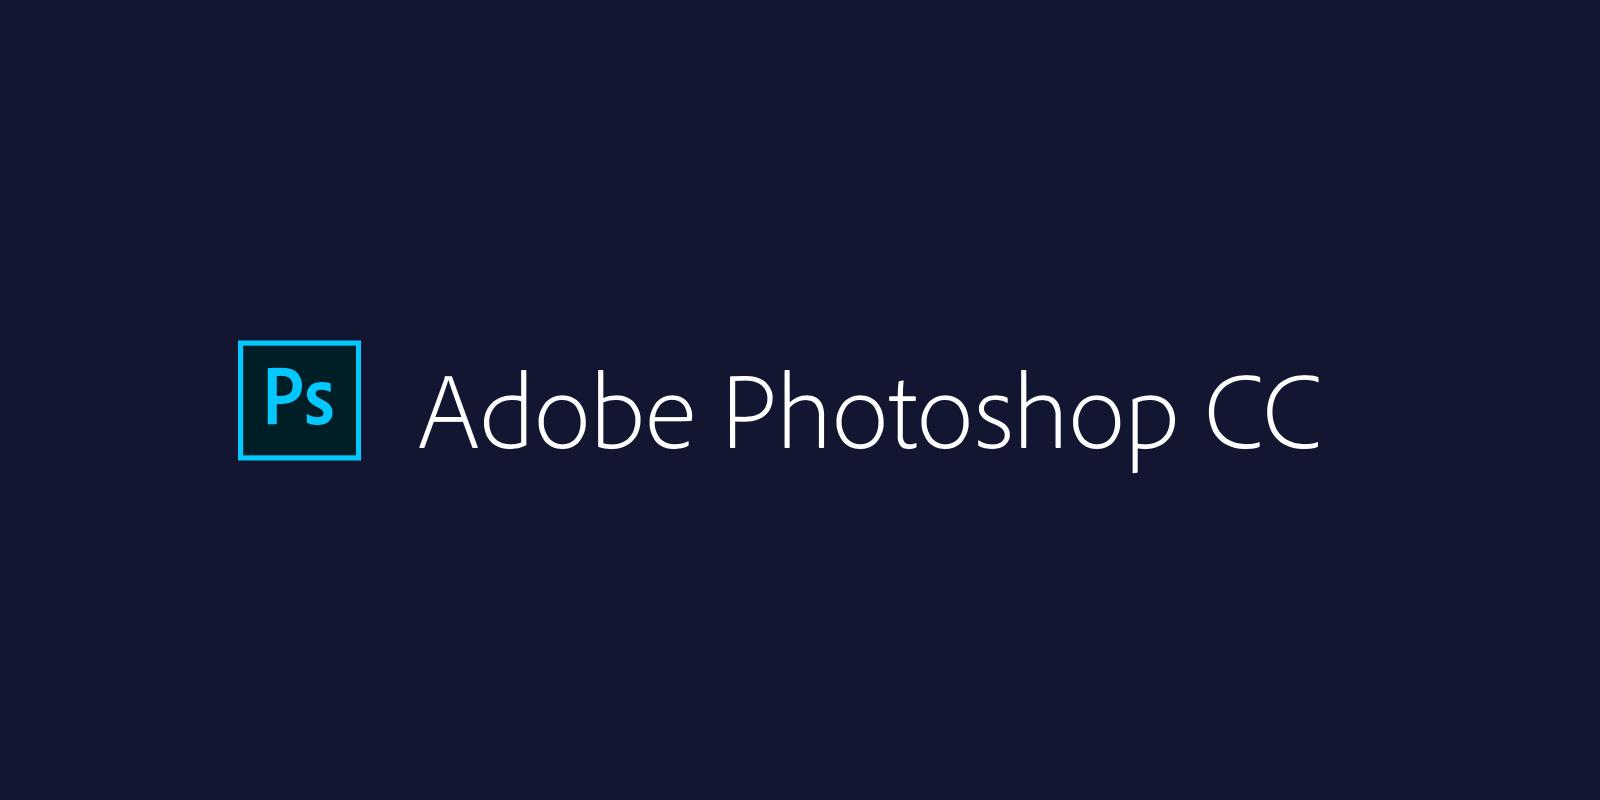 28 Photoshop Tutorials for Creating a Logo Design 2019.